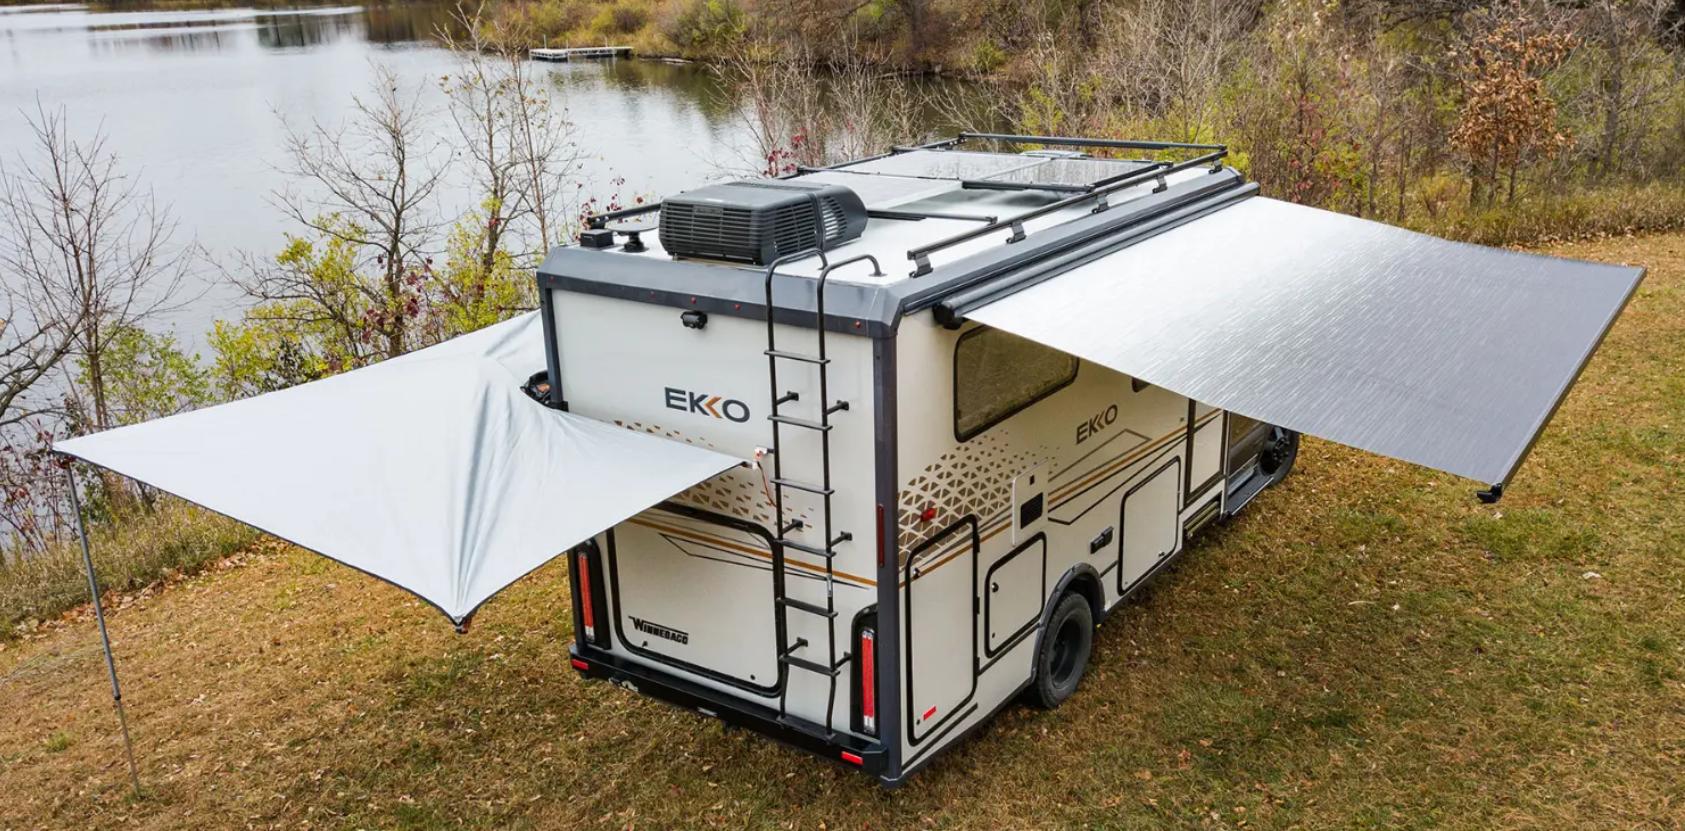 Introducing Winnebago's Newest Class C Motorhome: The Ekko